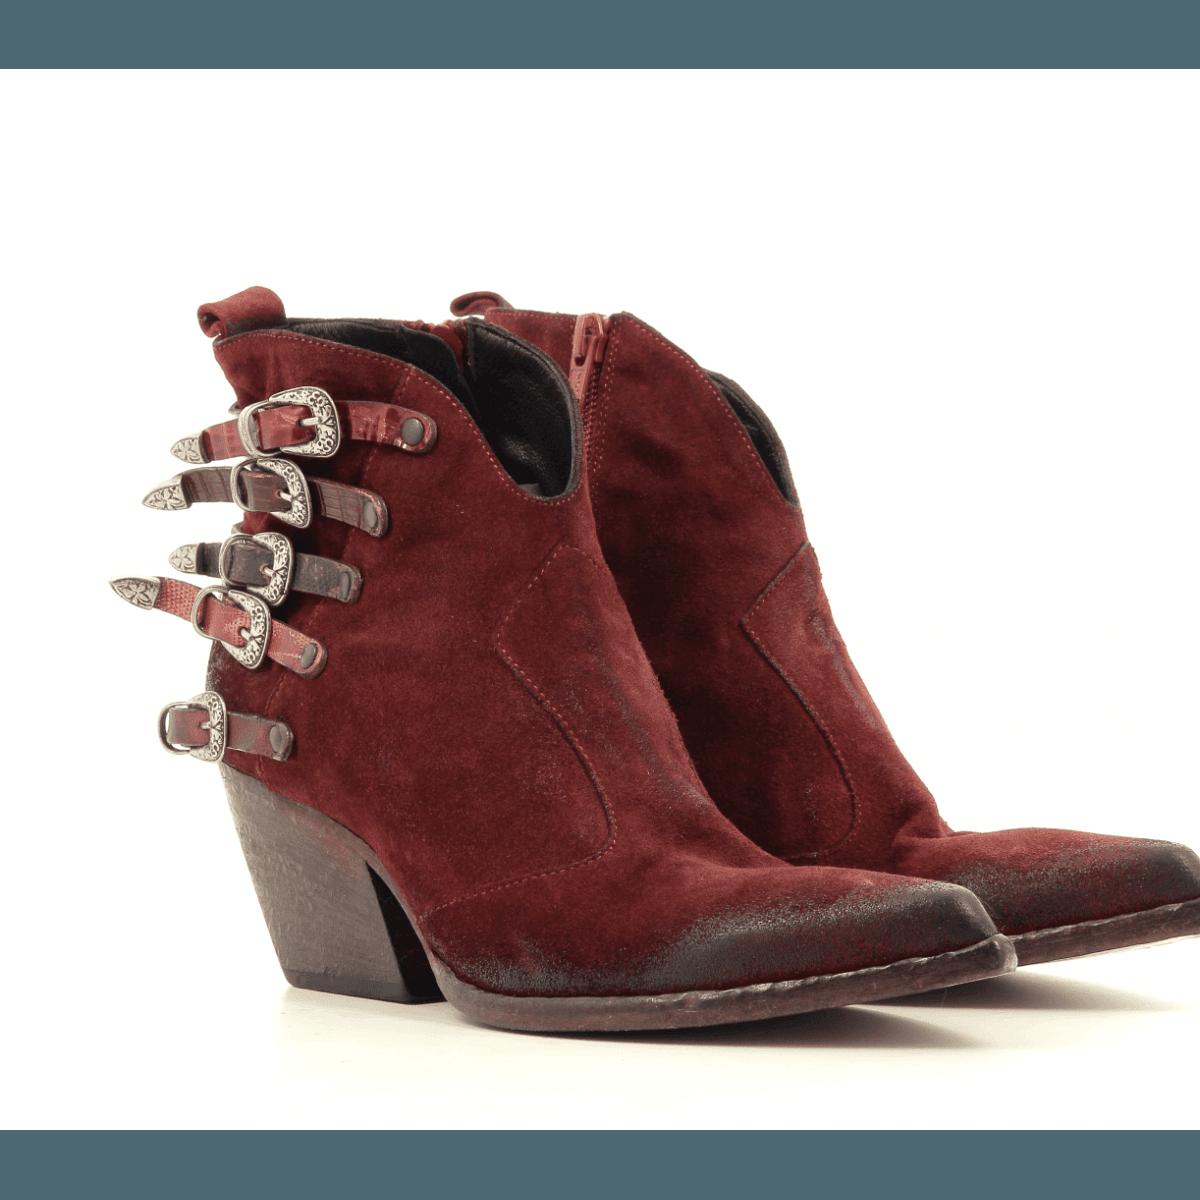 "Bottines style ""Santiag"" en daim rouge Elena Iachi - E2045r"